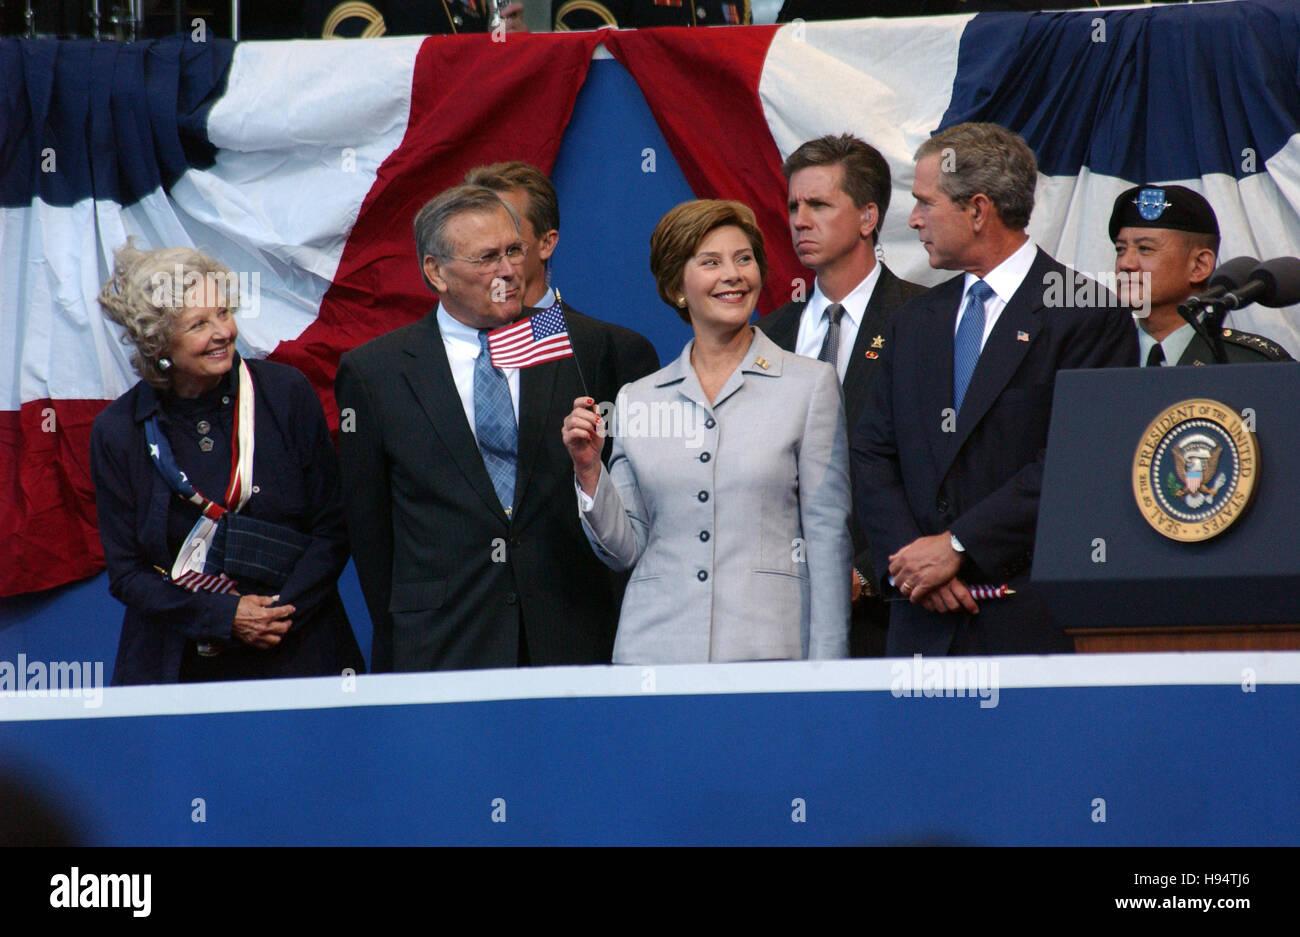 U.S. President George W. Bush, First Lady Laura Bush, Secretary of Defense Donald Rumsfeld and wife Joyce Rumsfeld - Stock Image